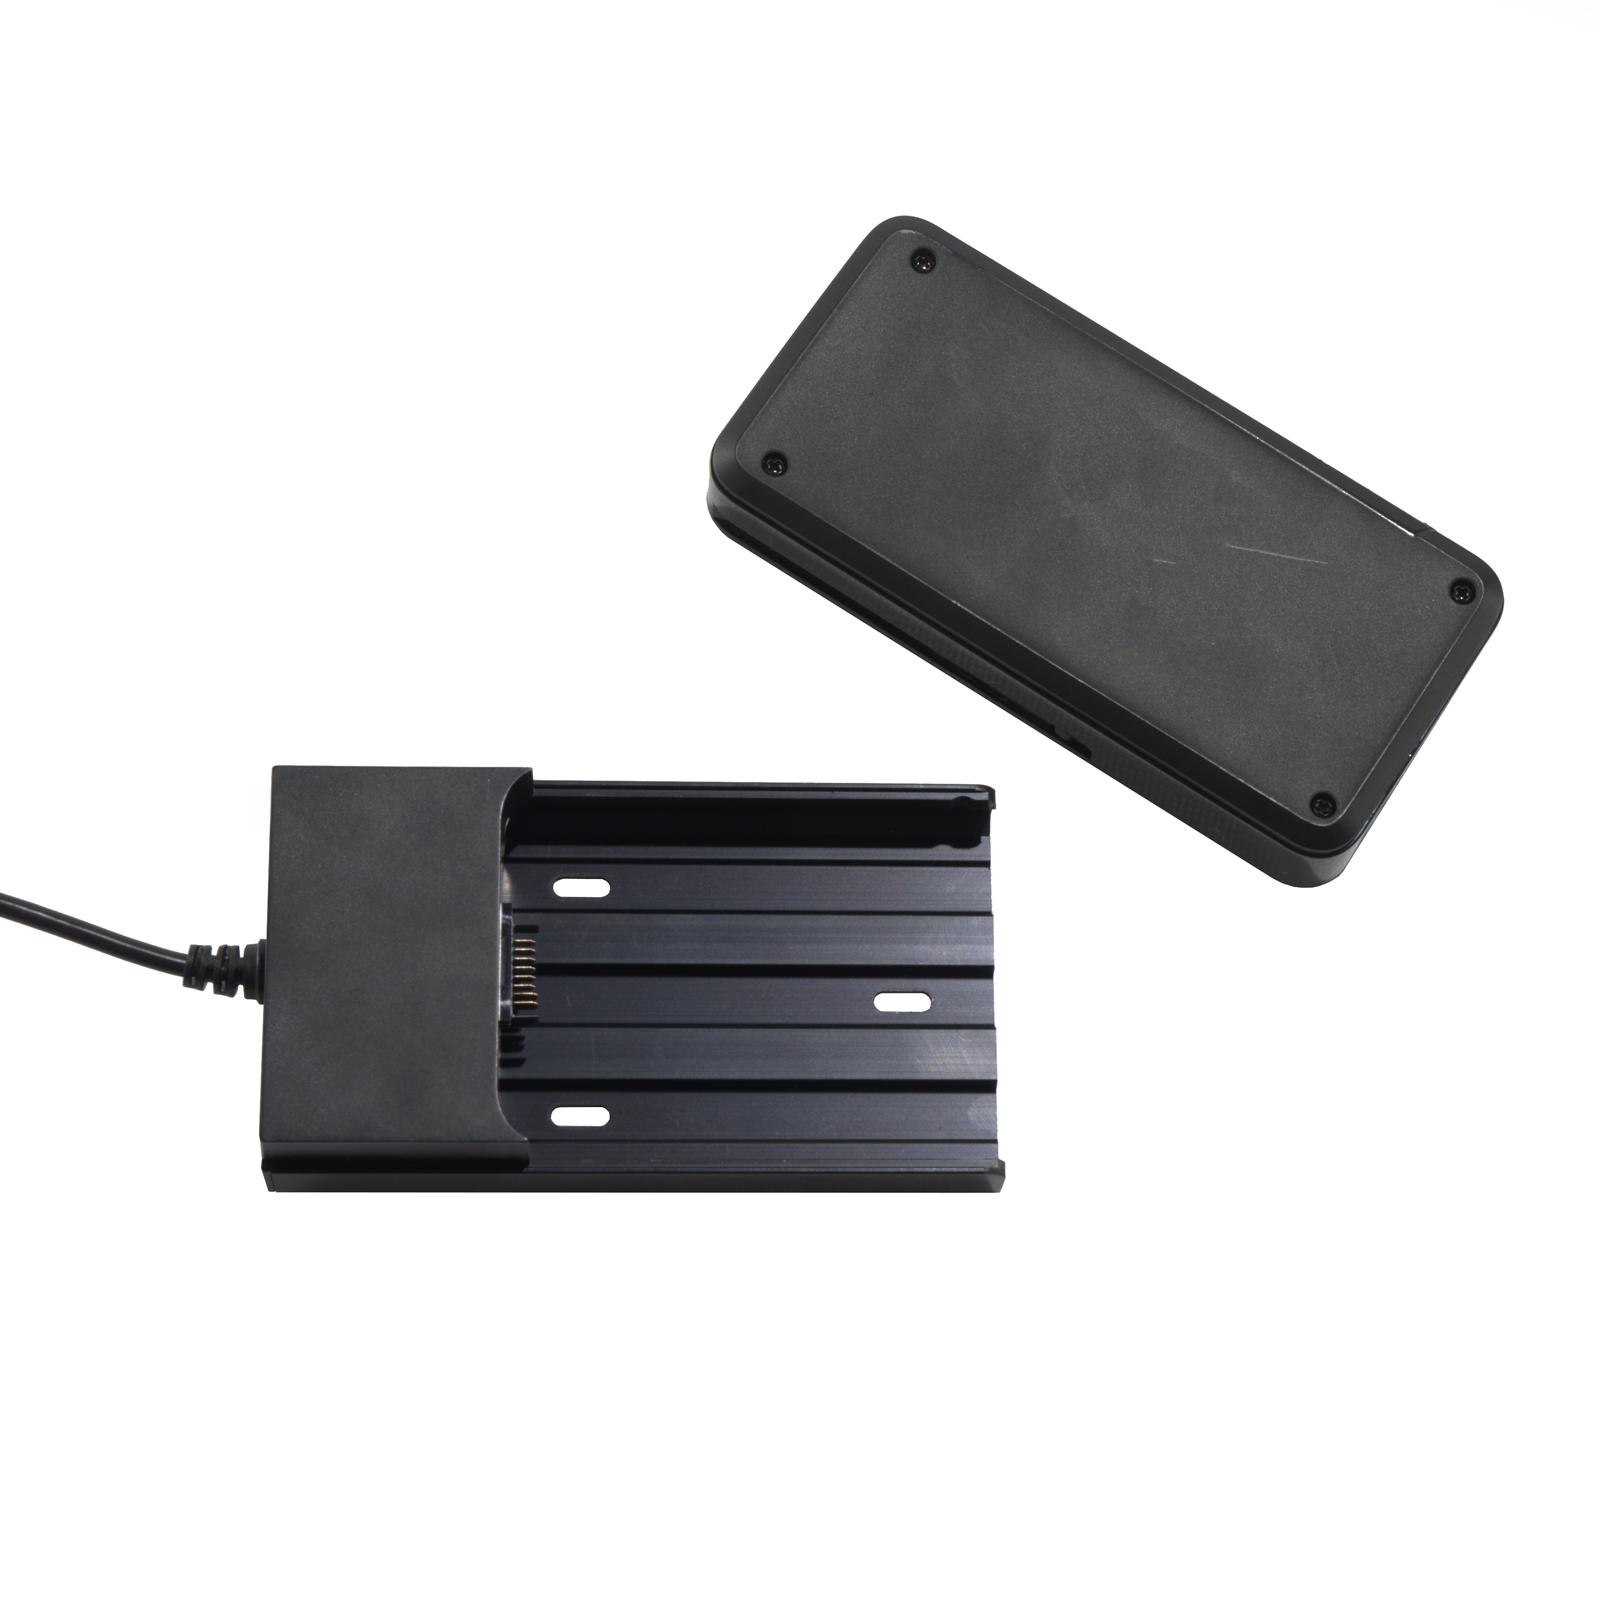 Plug Socket Elev8 Touch Battery Pack